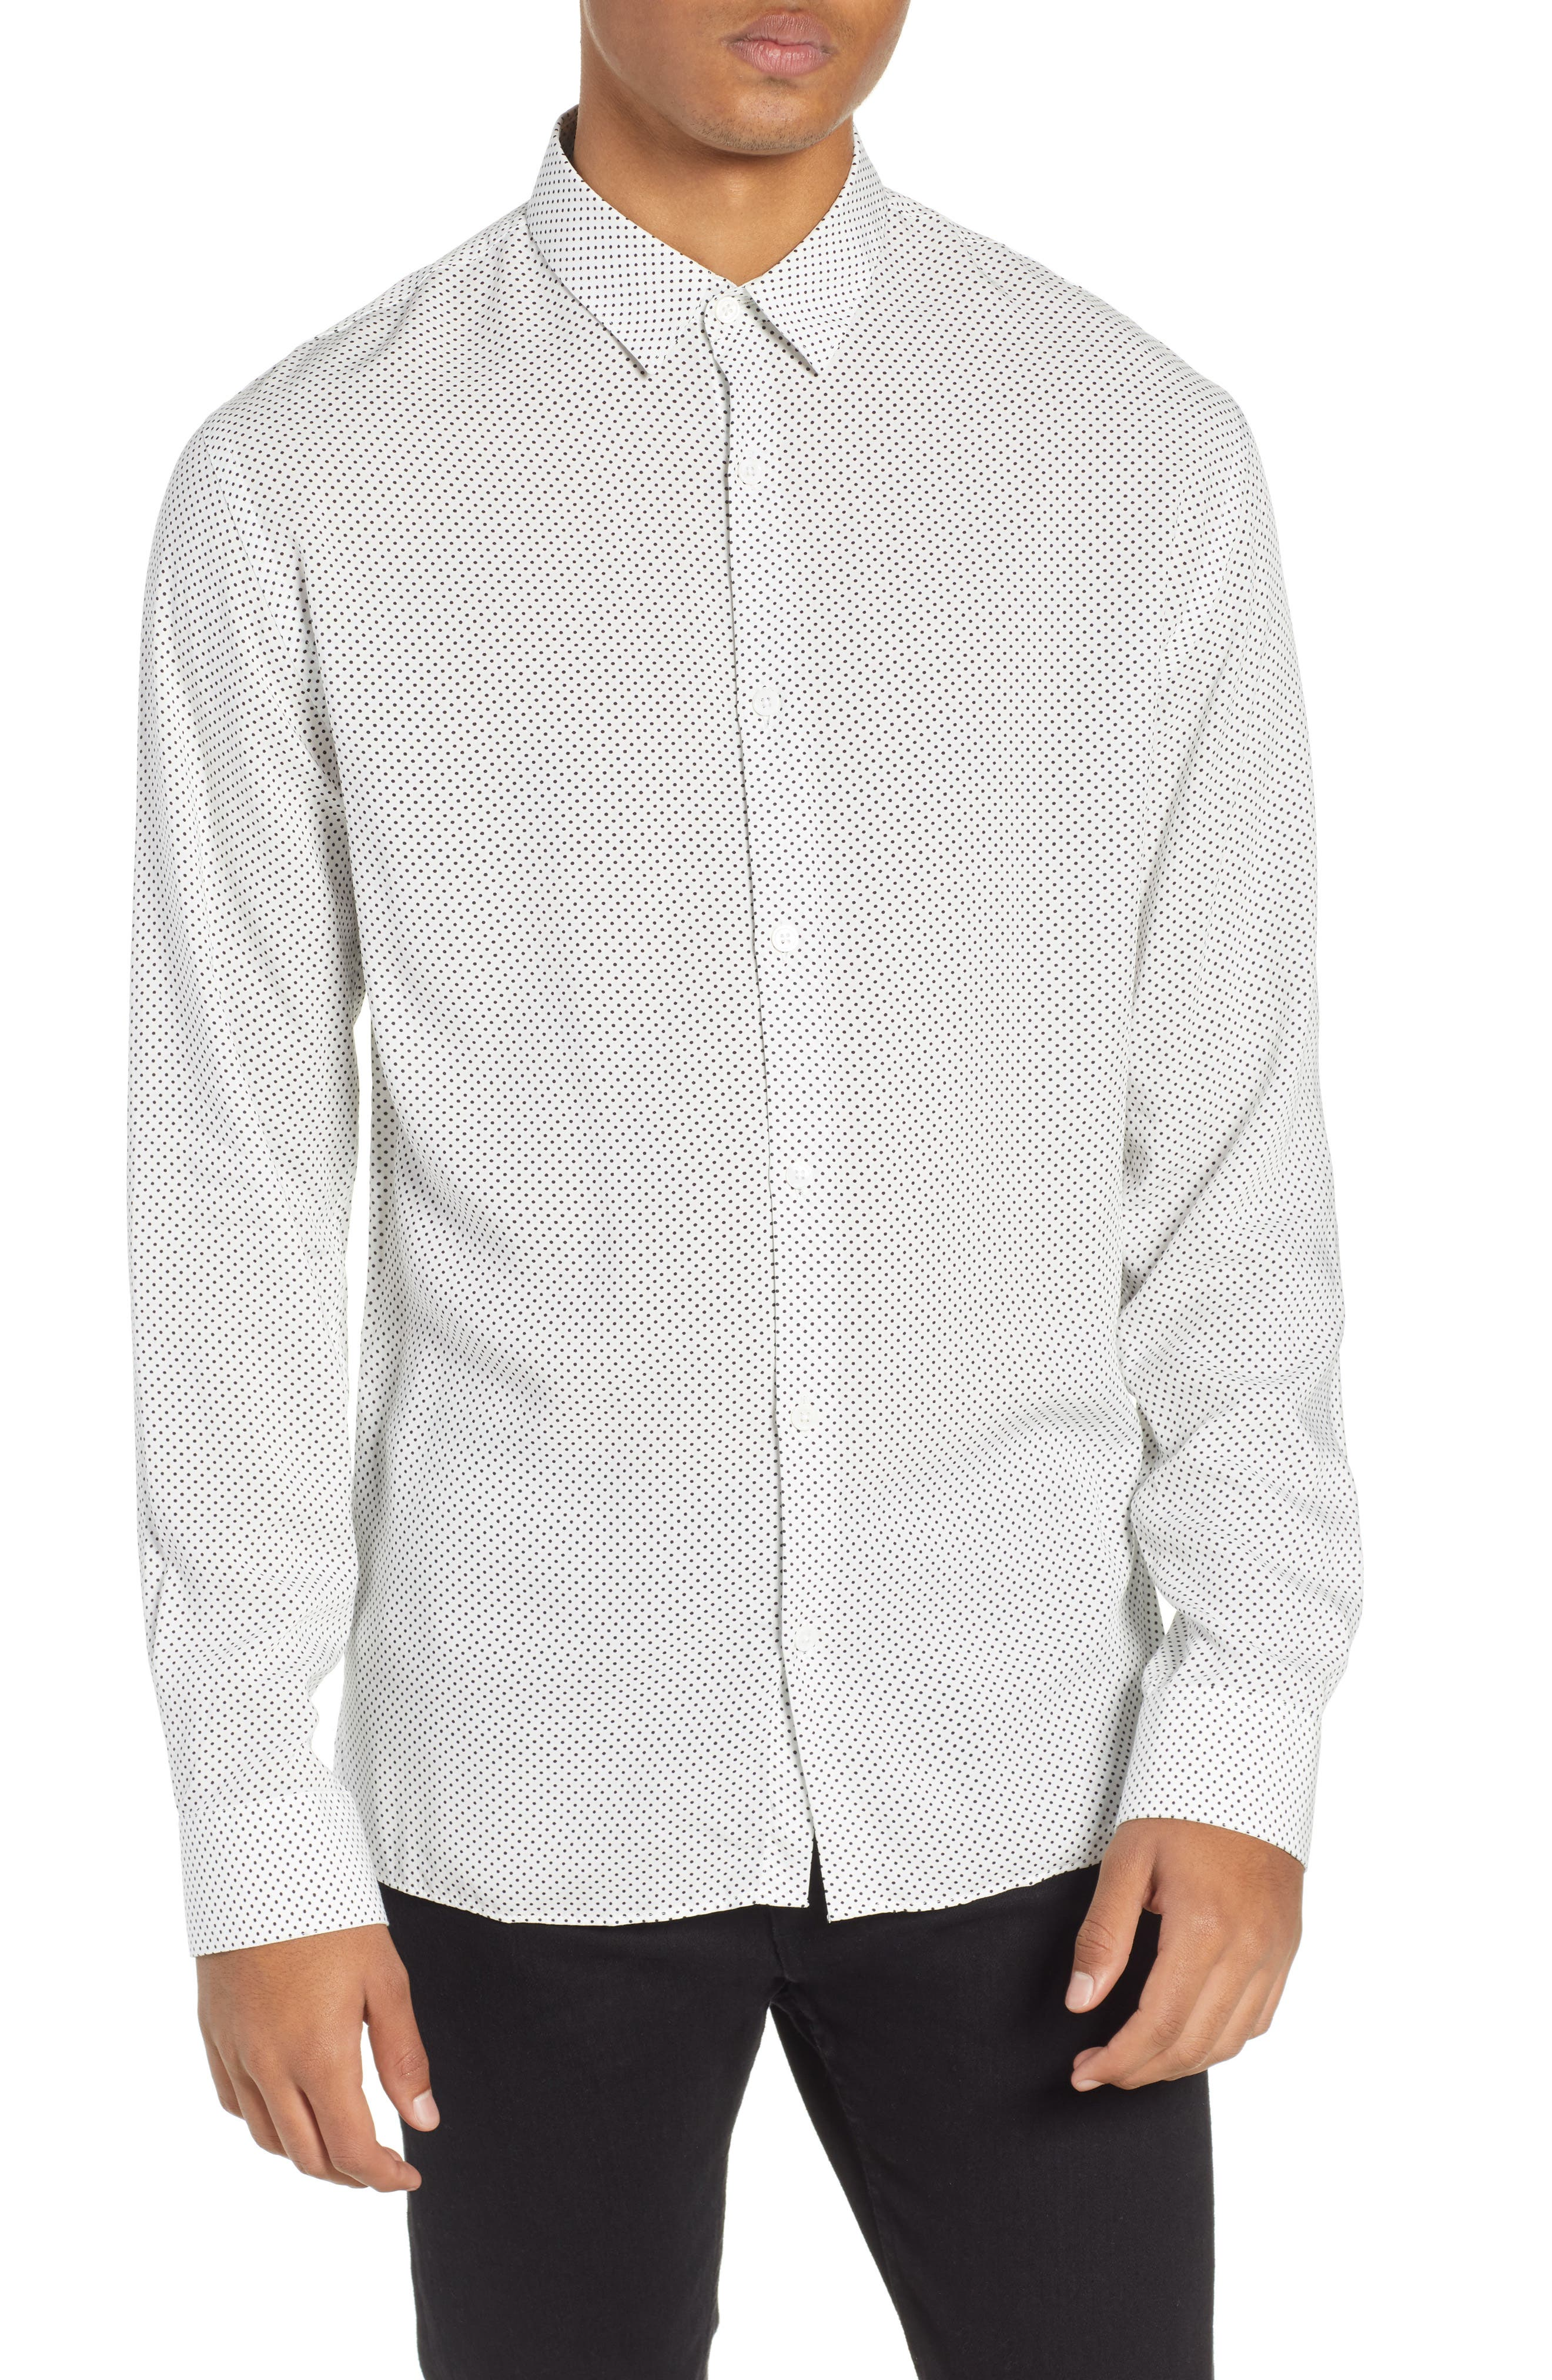 THE KOOPLES Dot Print Sport Shirt, Main, color, BEIGE-BLACK